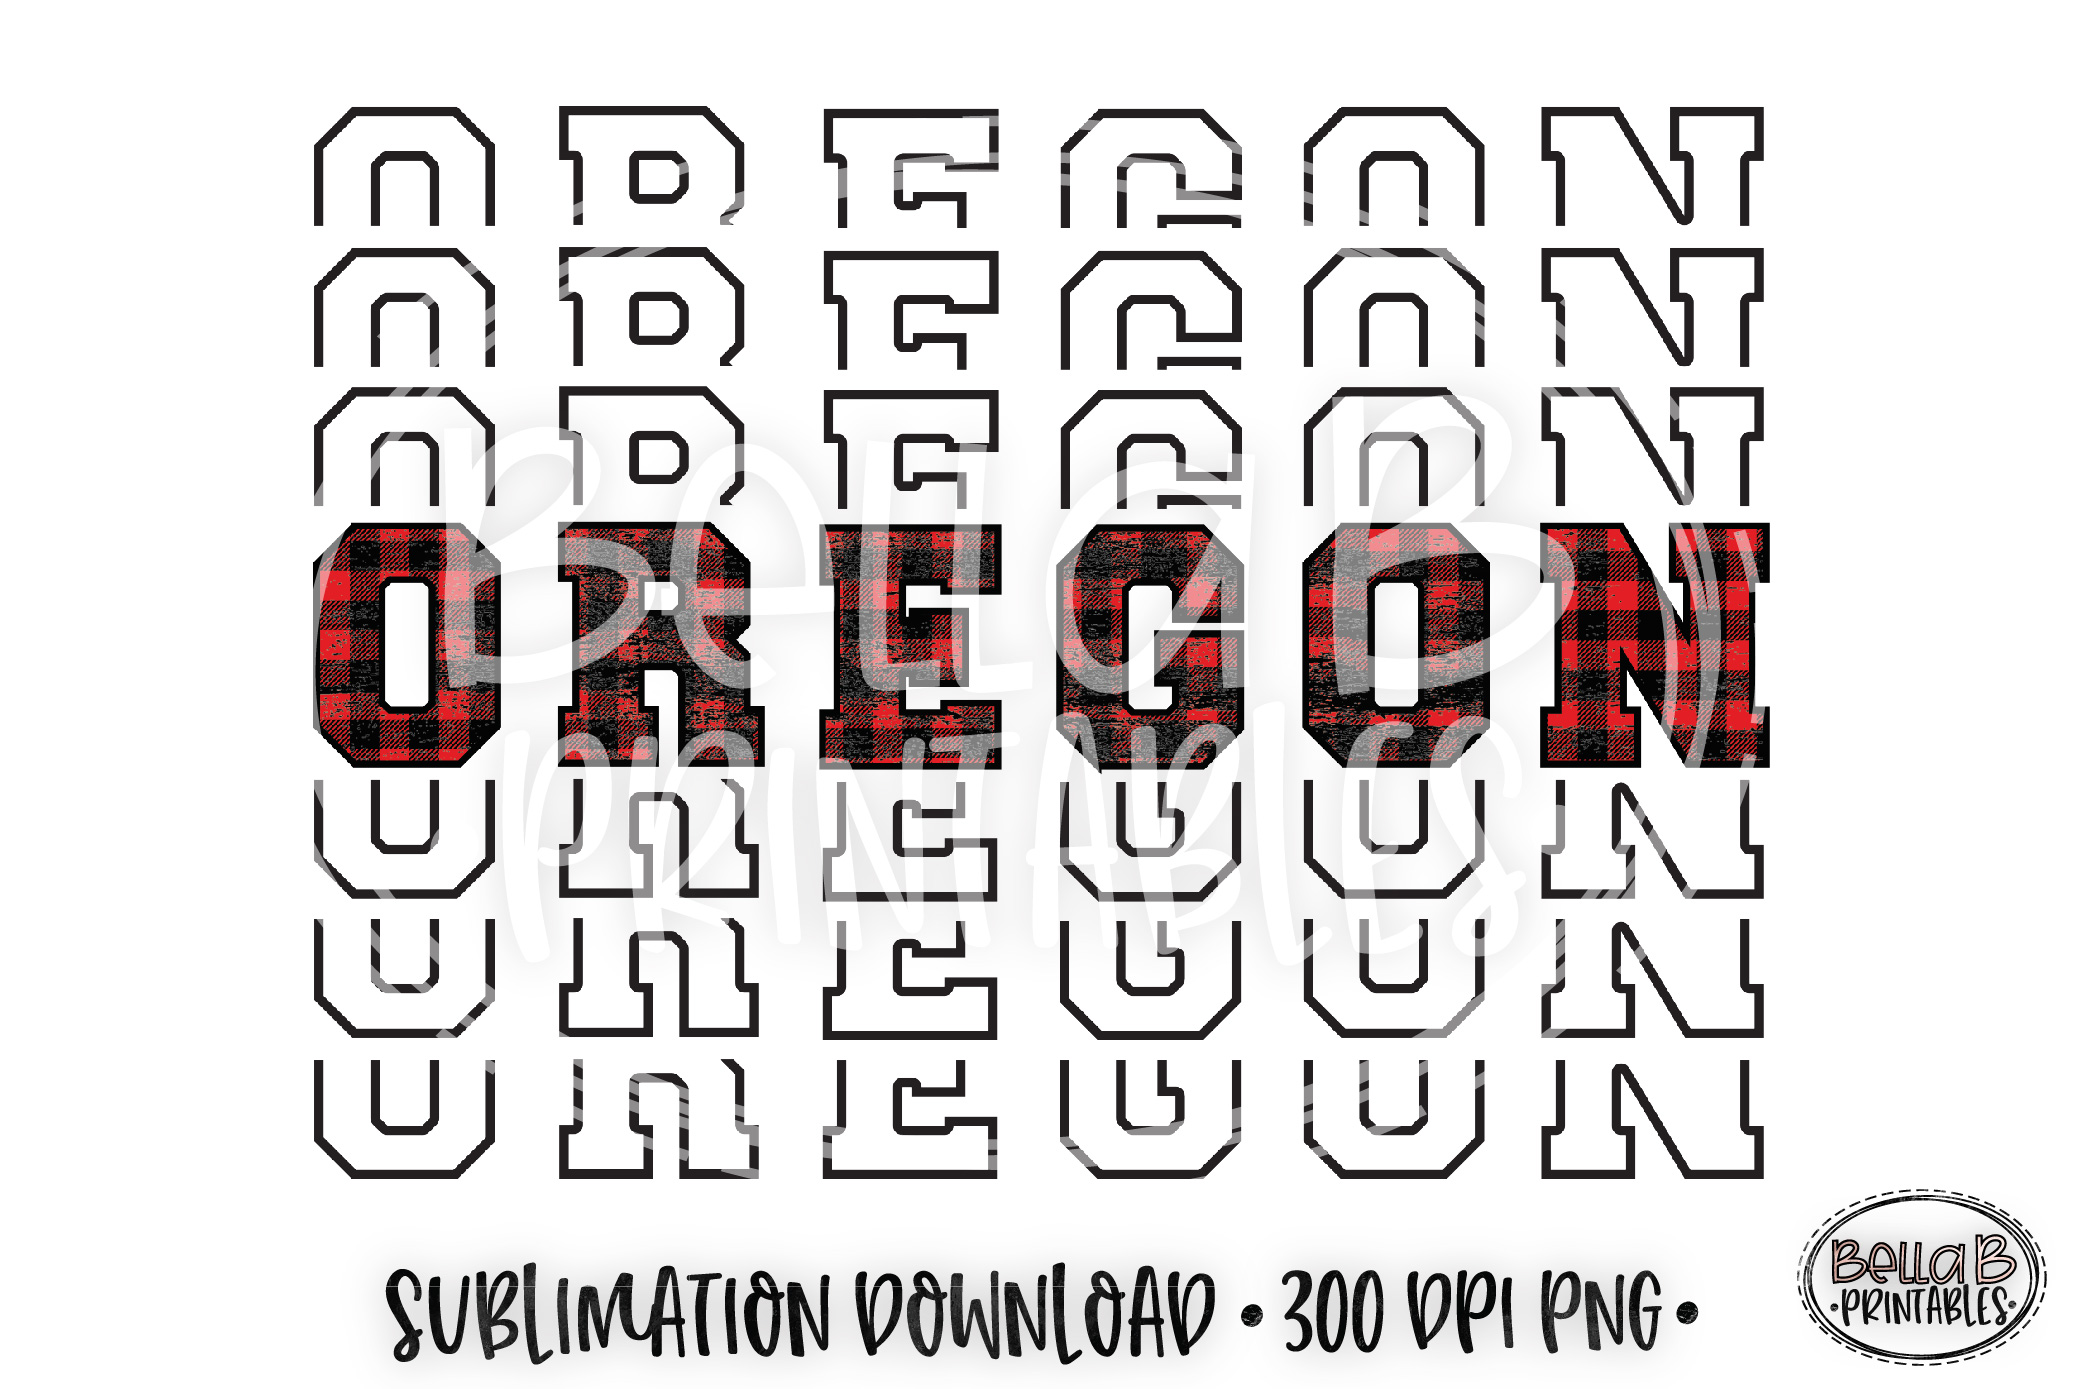 Oregon Sublimation Design, Buffalo Plaid, Mirrored Design example image 1